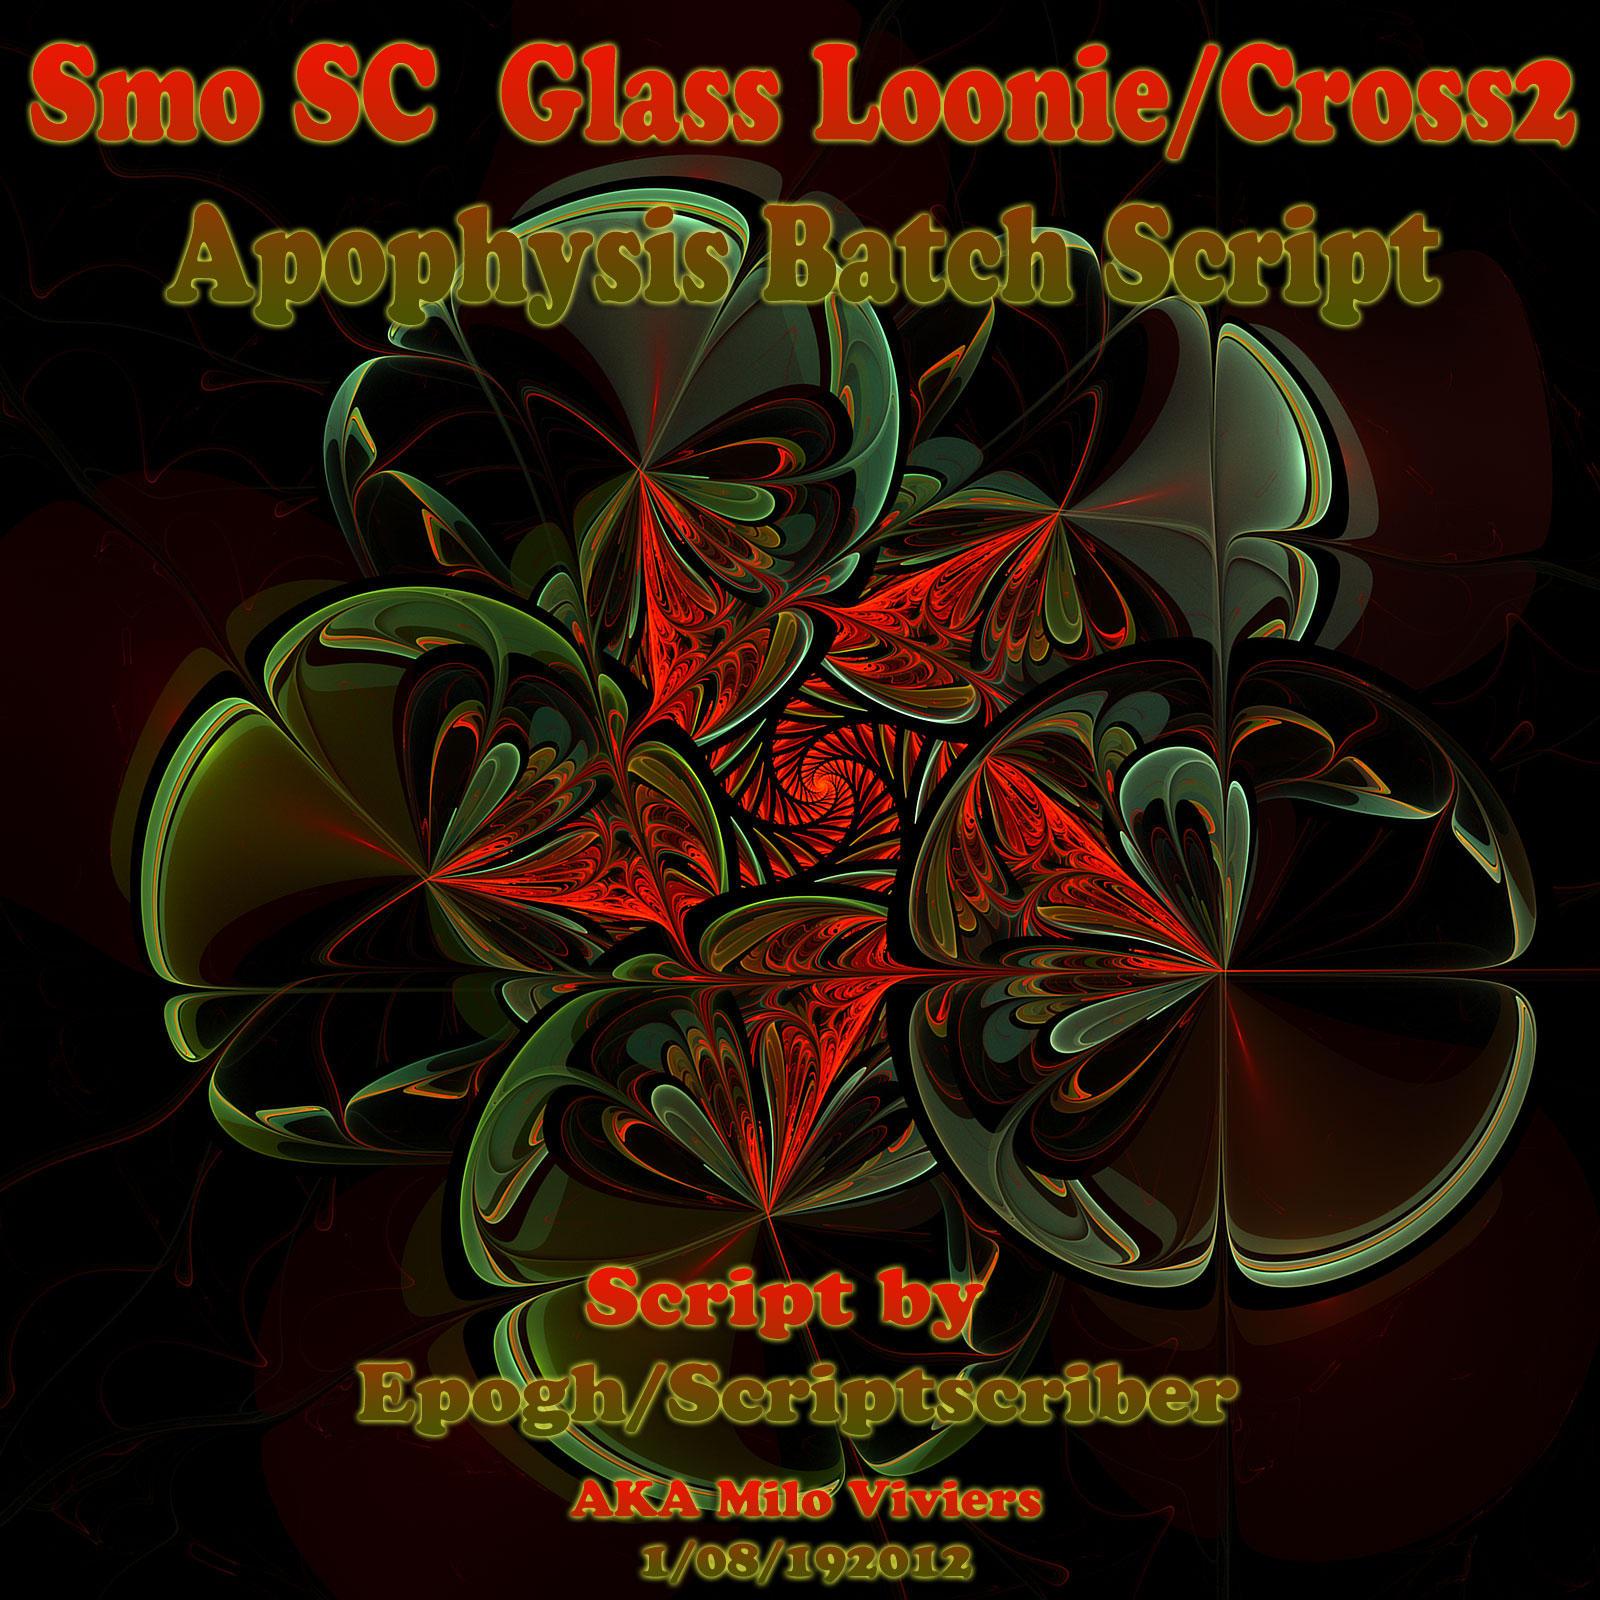 Smo SC  Glass Loonie/Cross2 Apophysis Batch Script by Scriptscriber